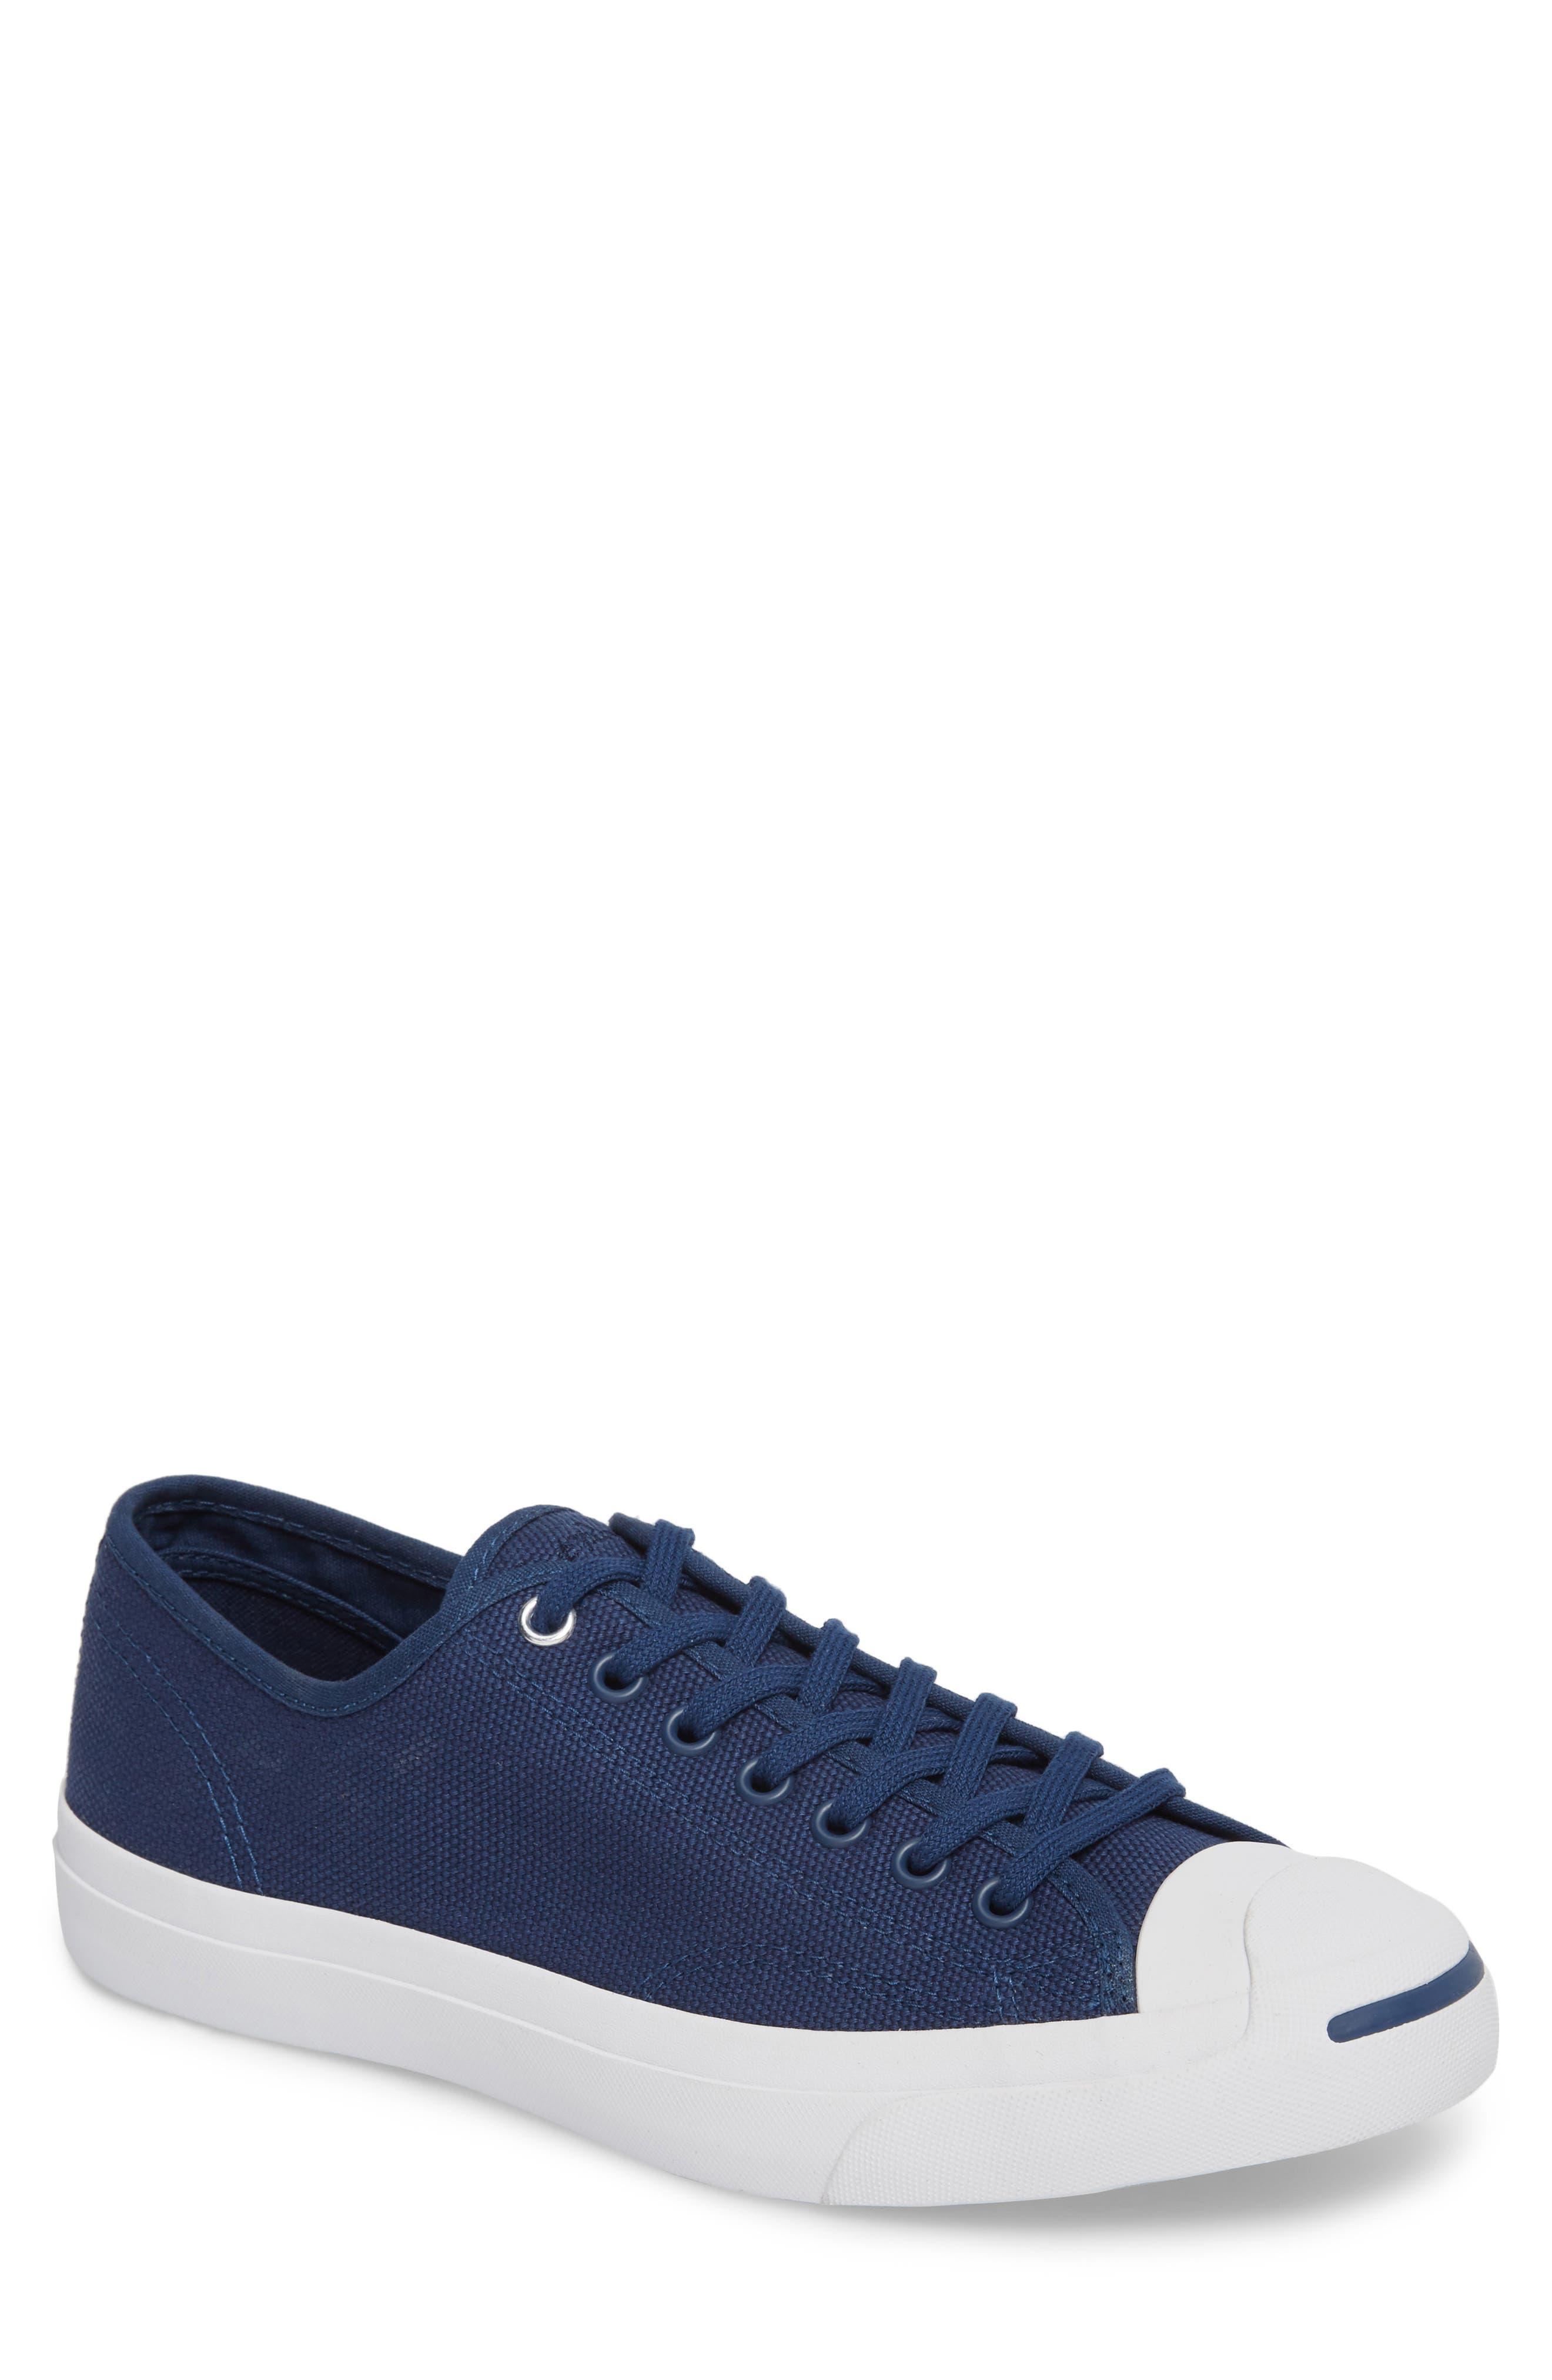 converse shoes new topshop \/topman store near